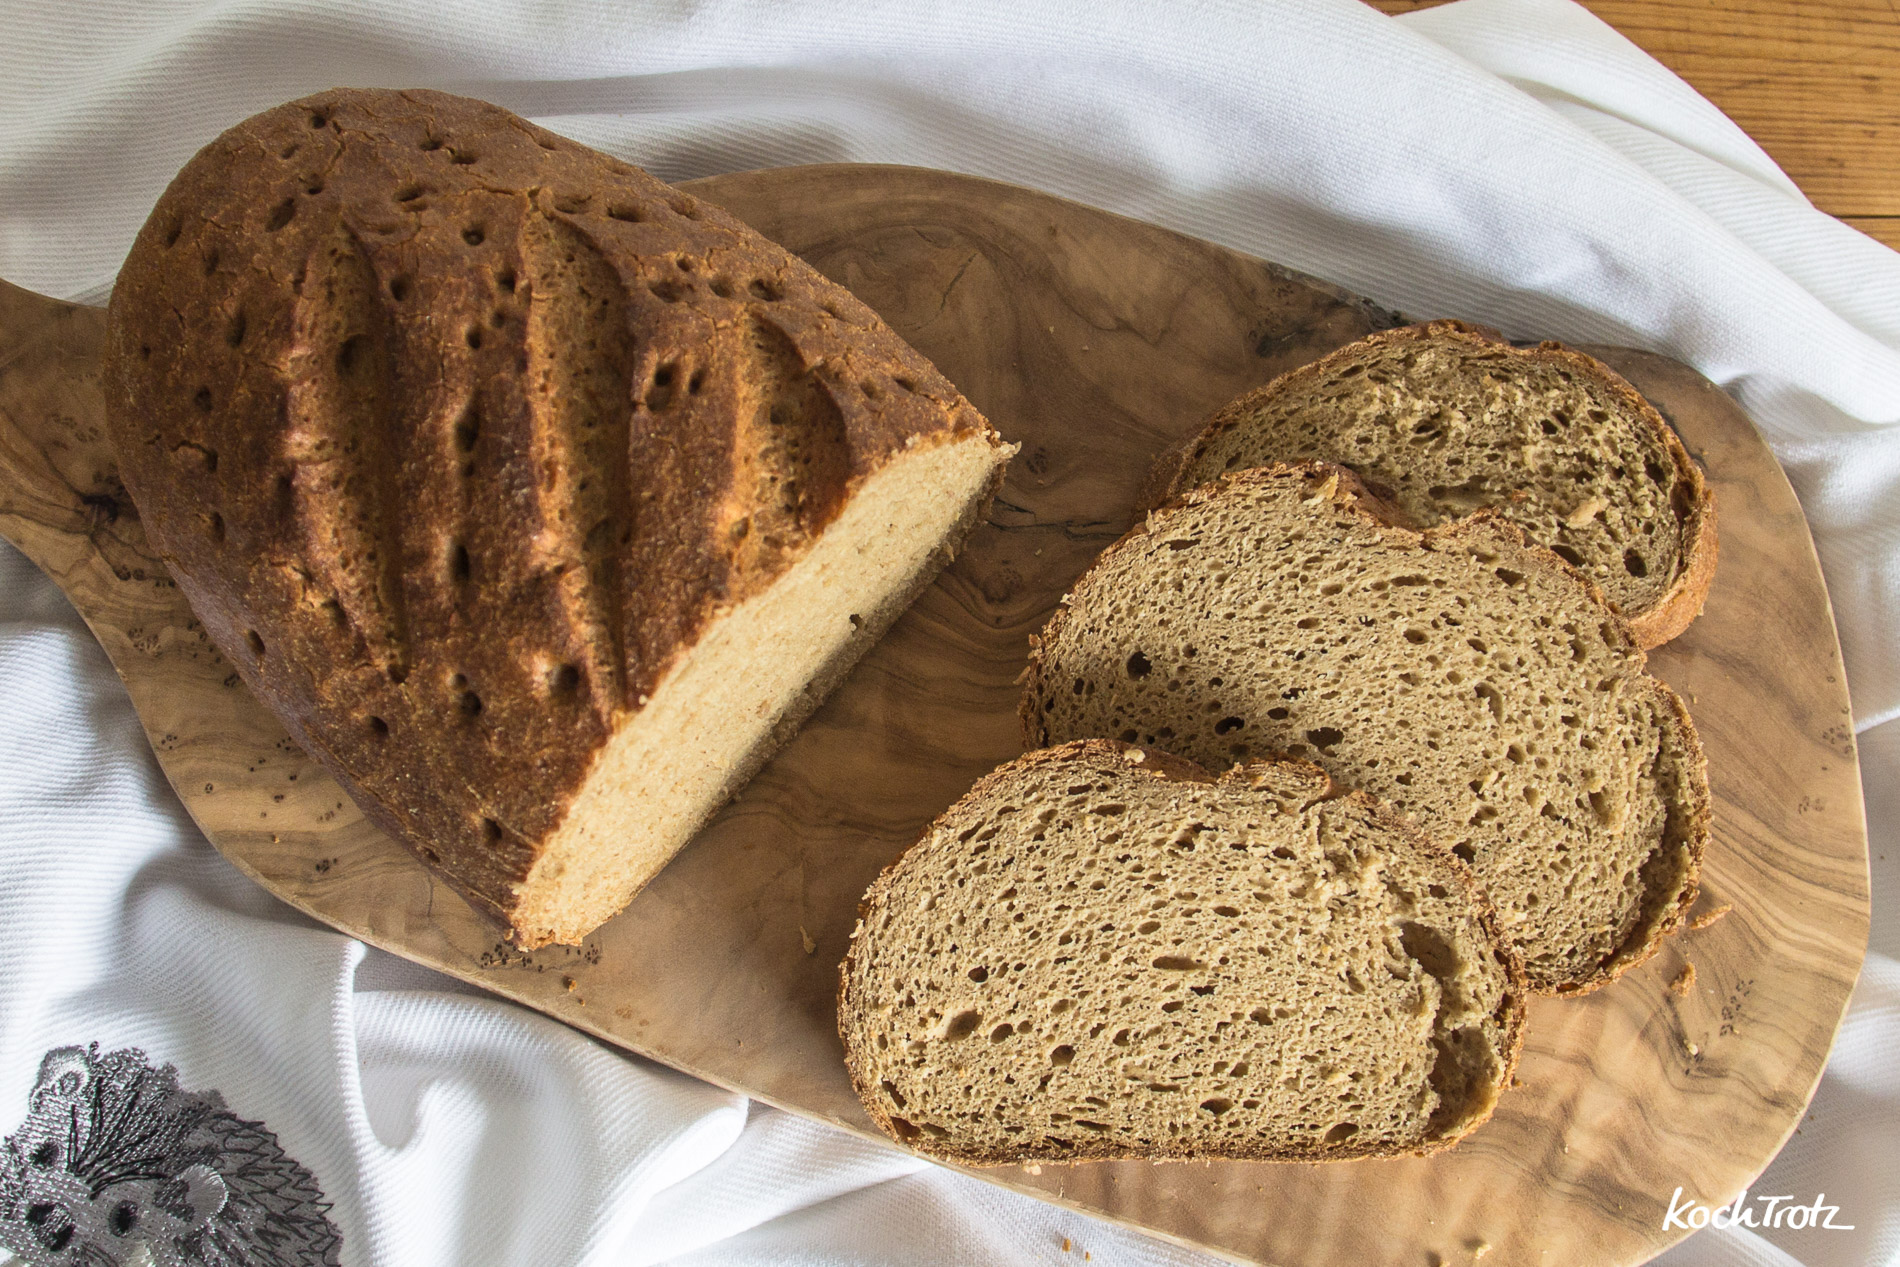 Produkttest | glutenfreie Backwaren von Böcker | Goldleinsamenbrot